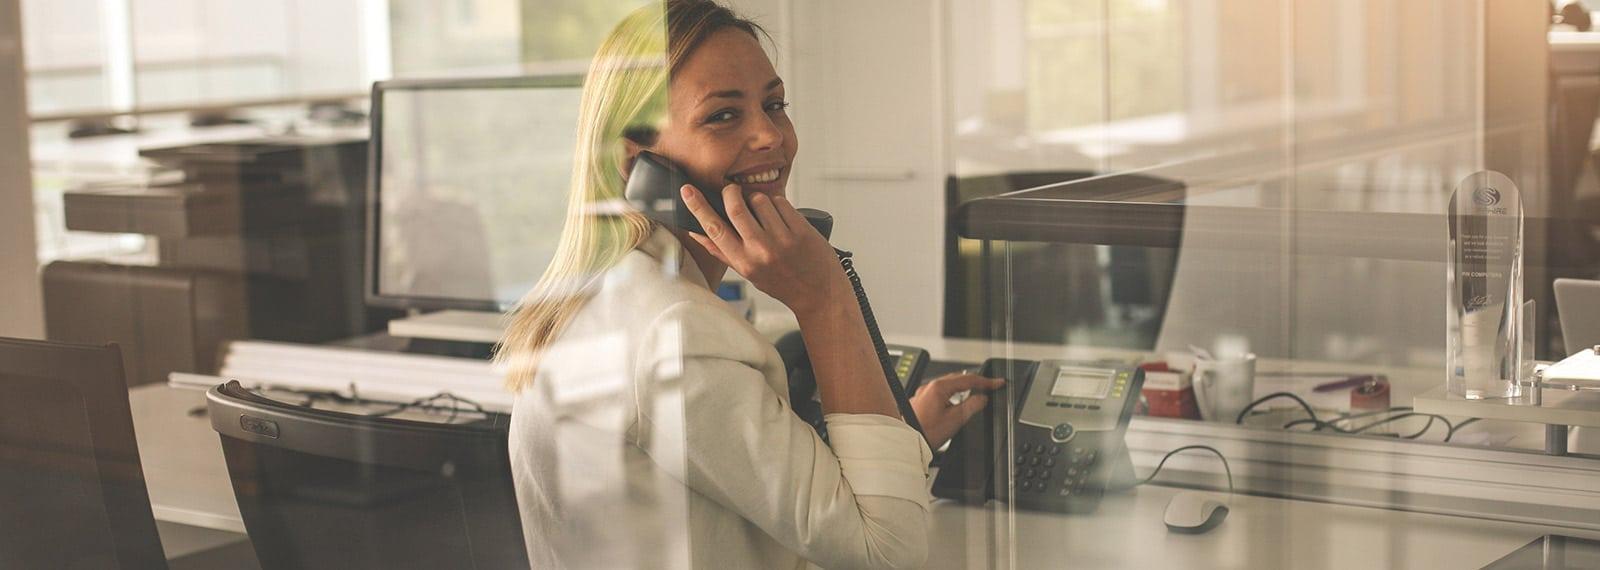 Junge Frau am Telefon im Fitness-Loft Callcenter